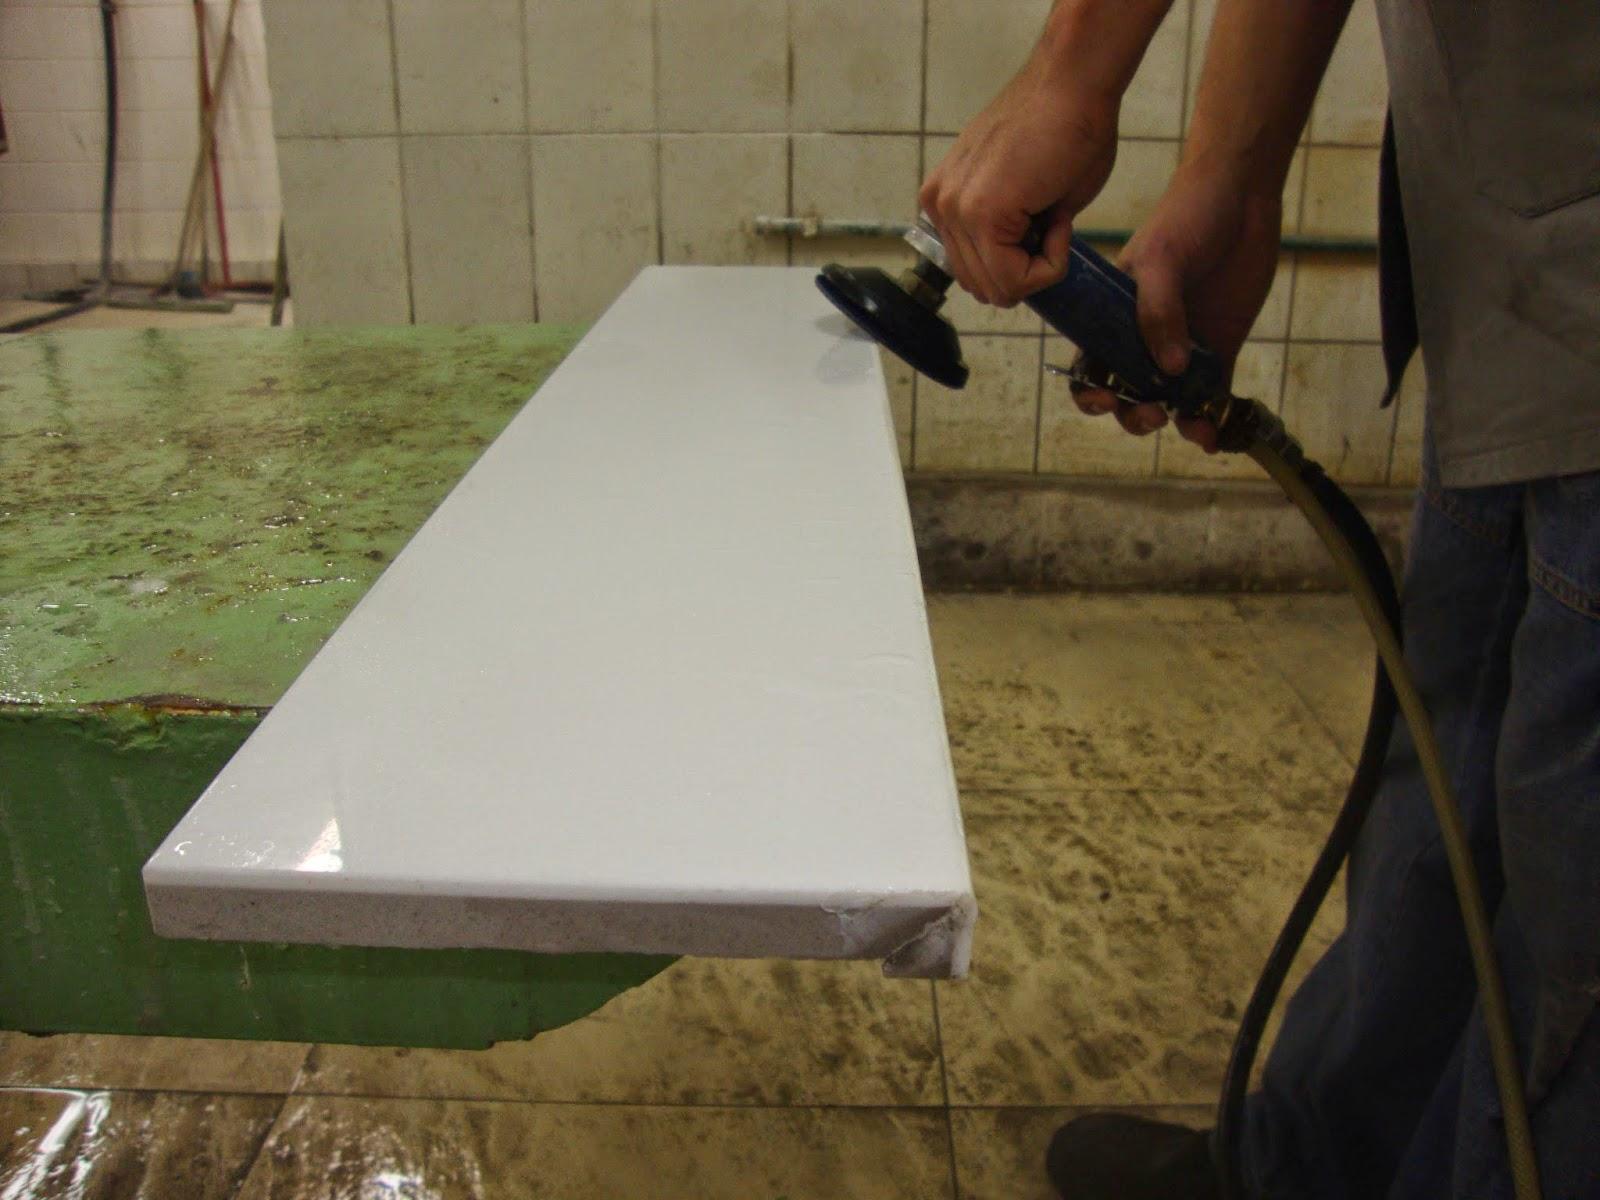 Artnuns fazendo polimento de partes da bancada de porcelanato 45 #614B2C 1600x1200